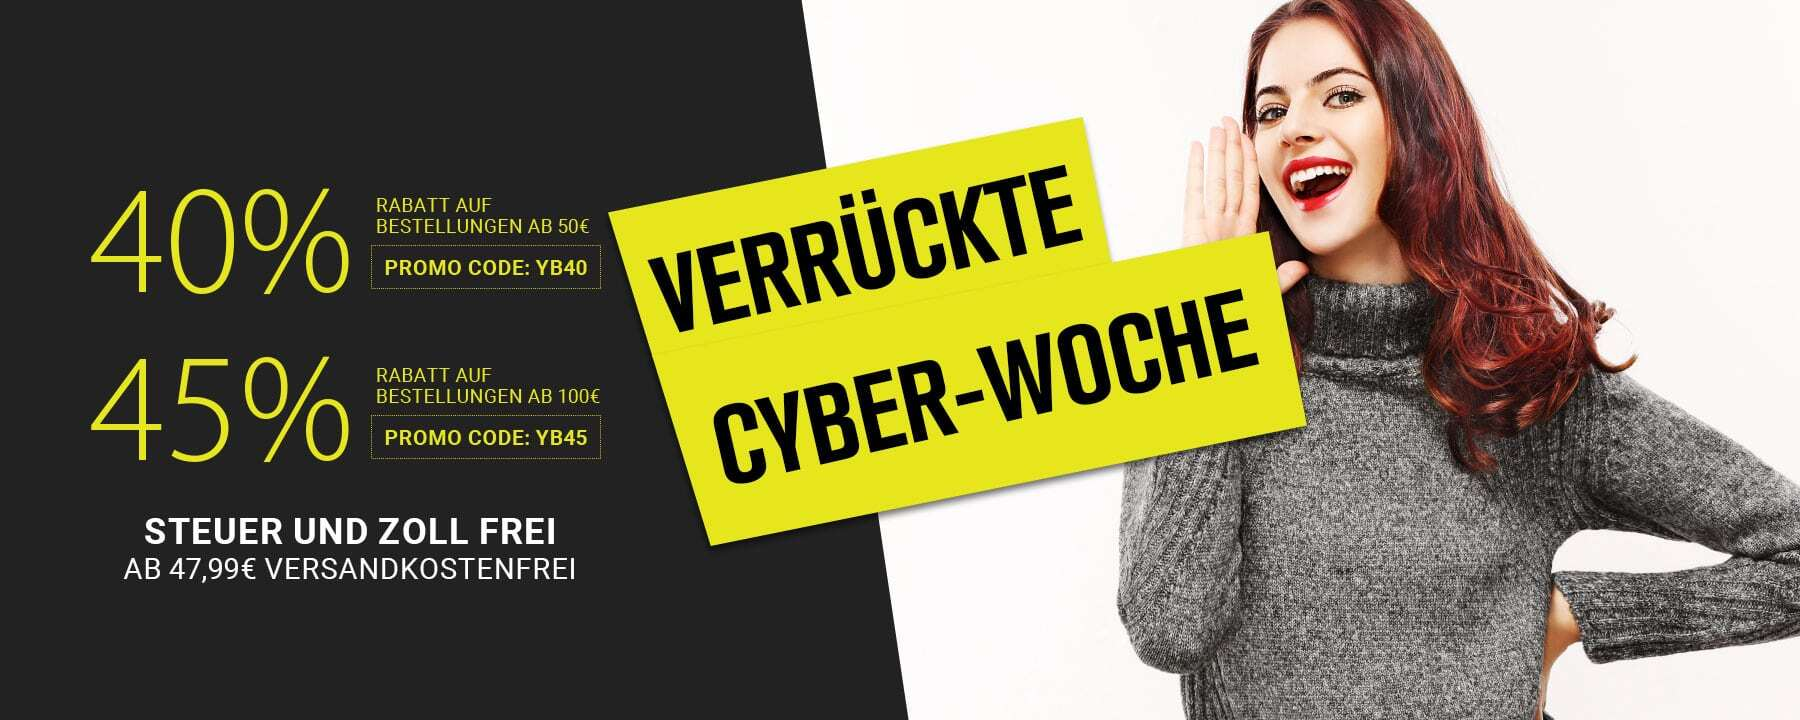 Verrückte Cyber-Woche